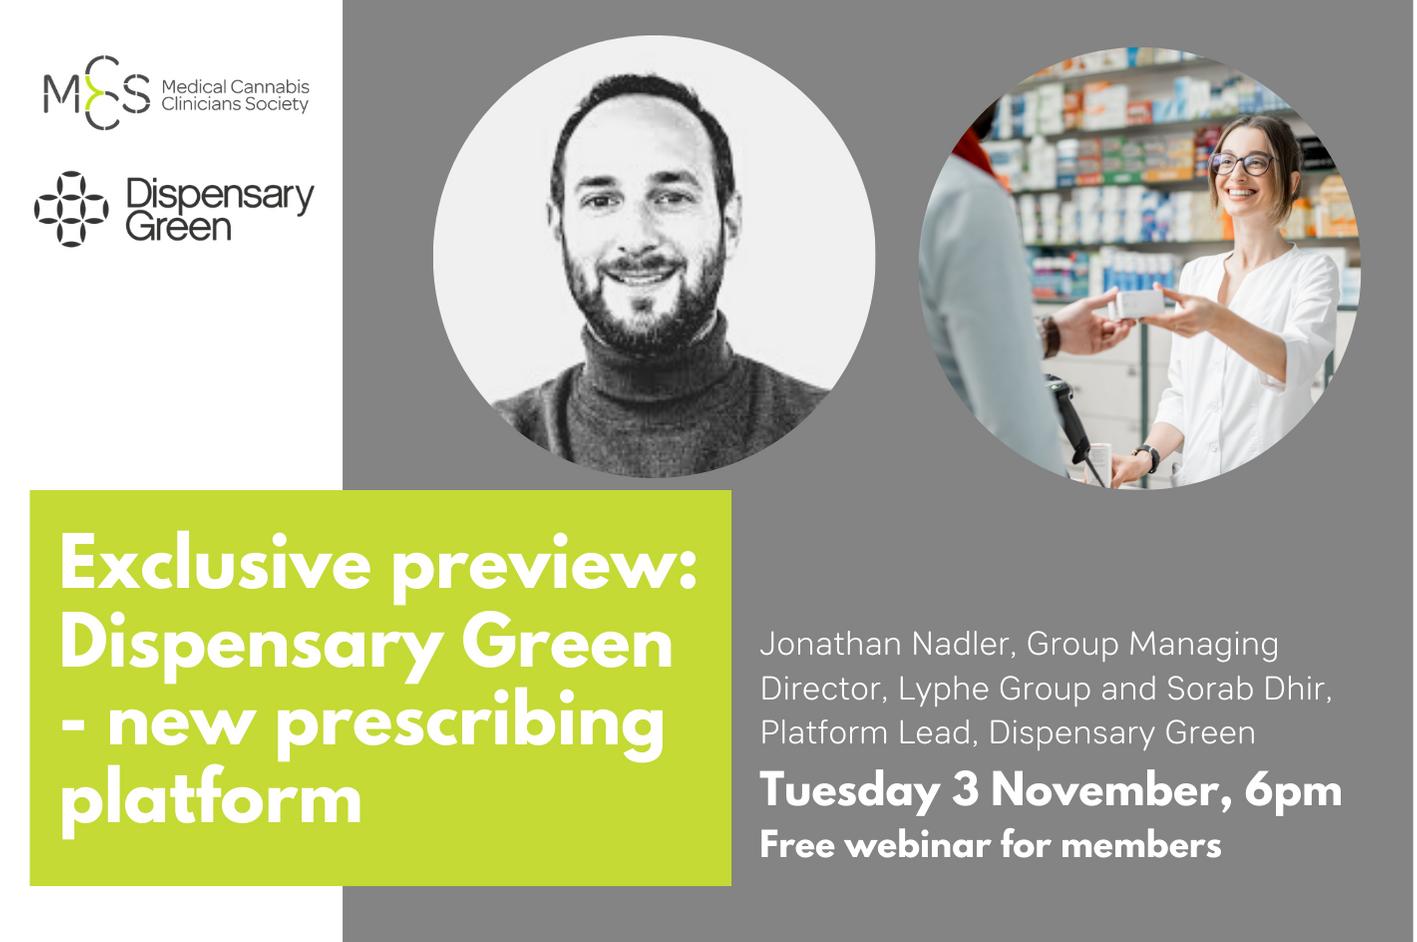 Webinar: Exclusive preview of Dispensary Green – new prescribing platform